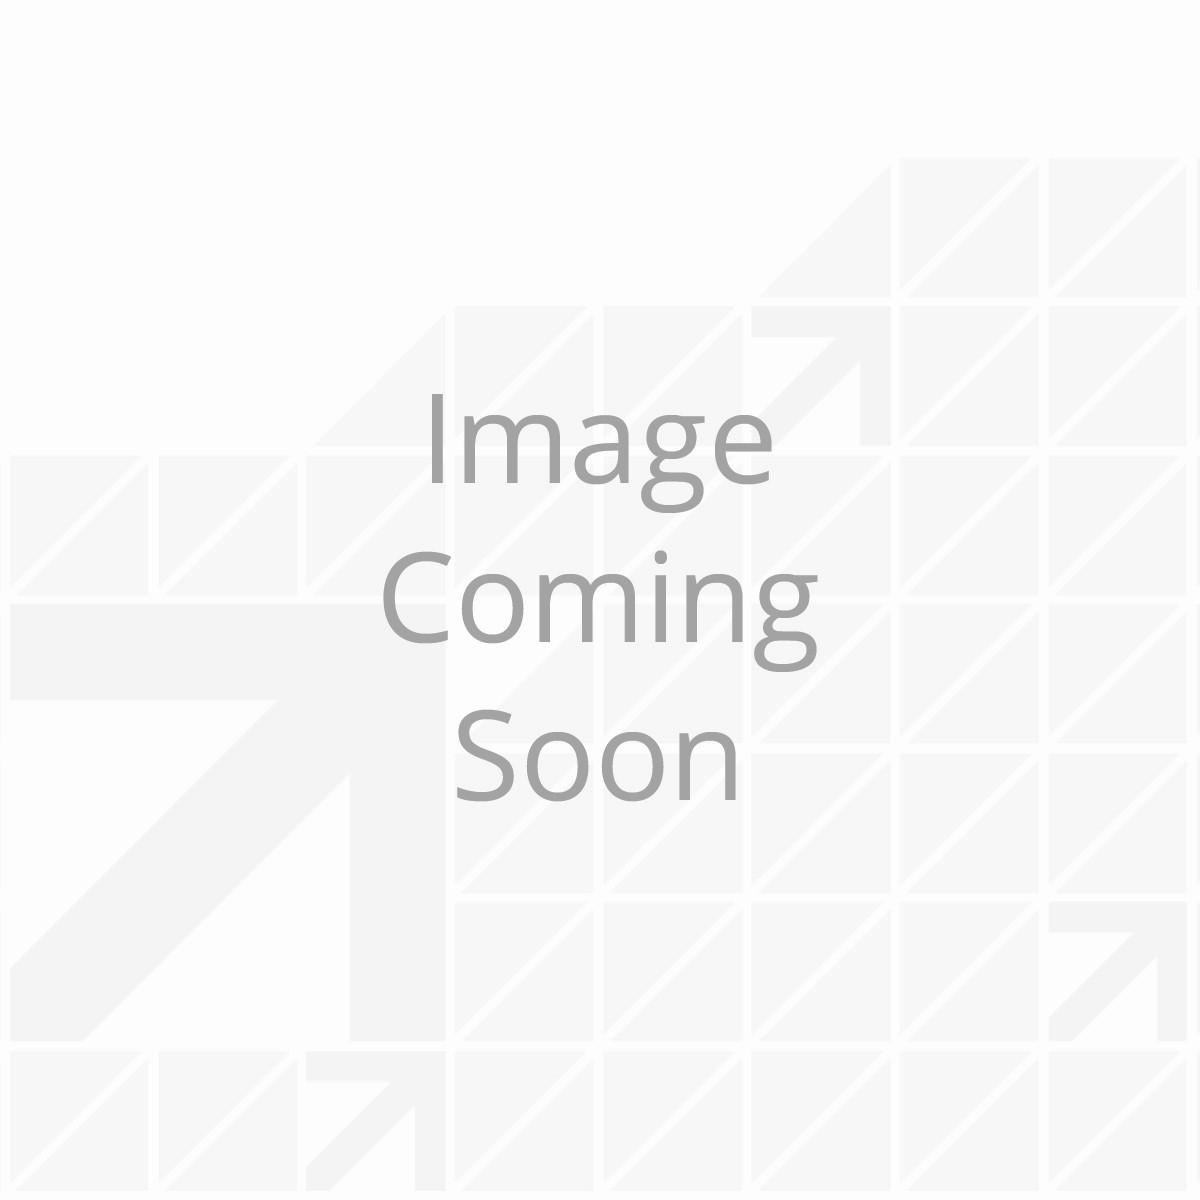 "Taylor Made Manual Bimini Kit - 8' x 10' x 1.25"" (Gray)"